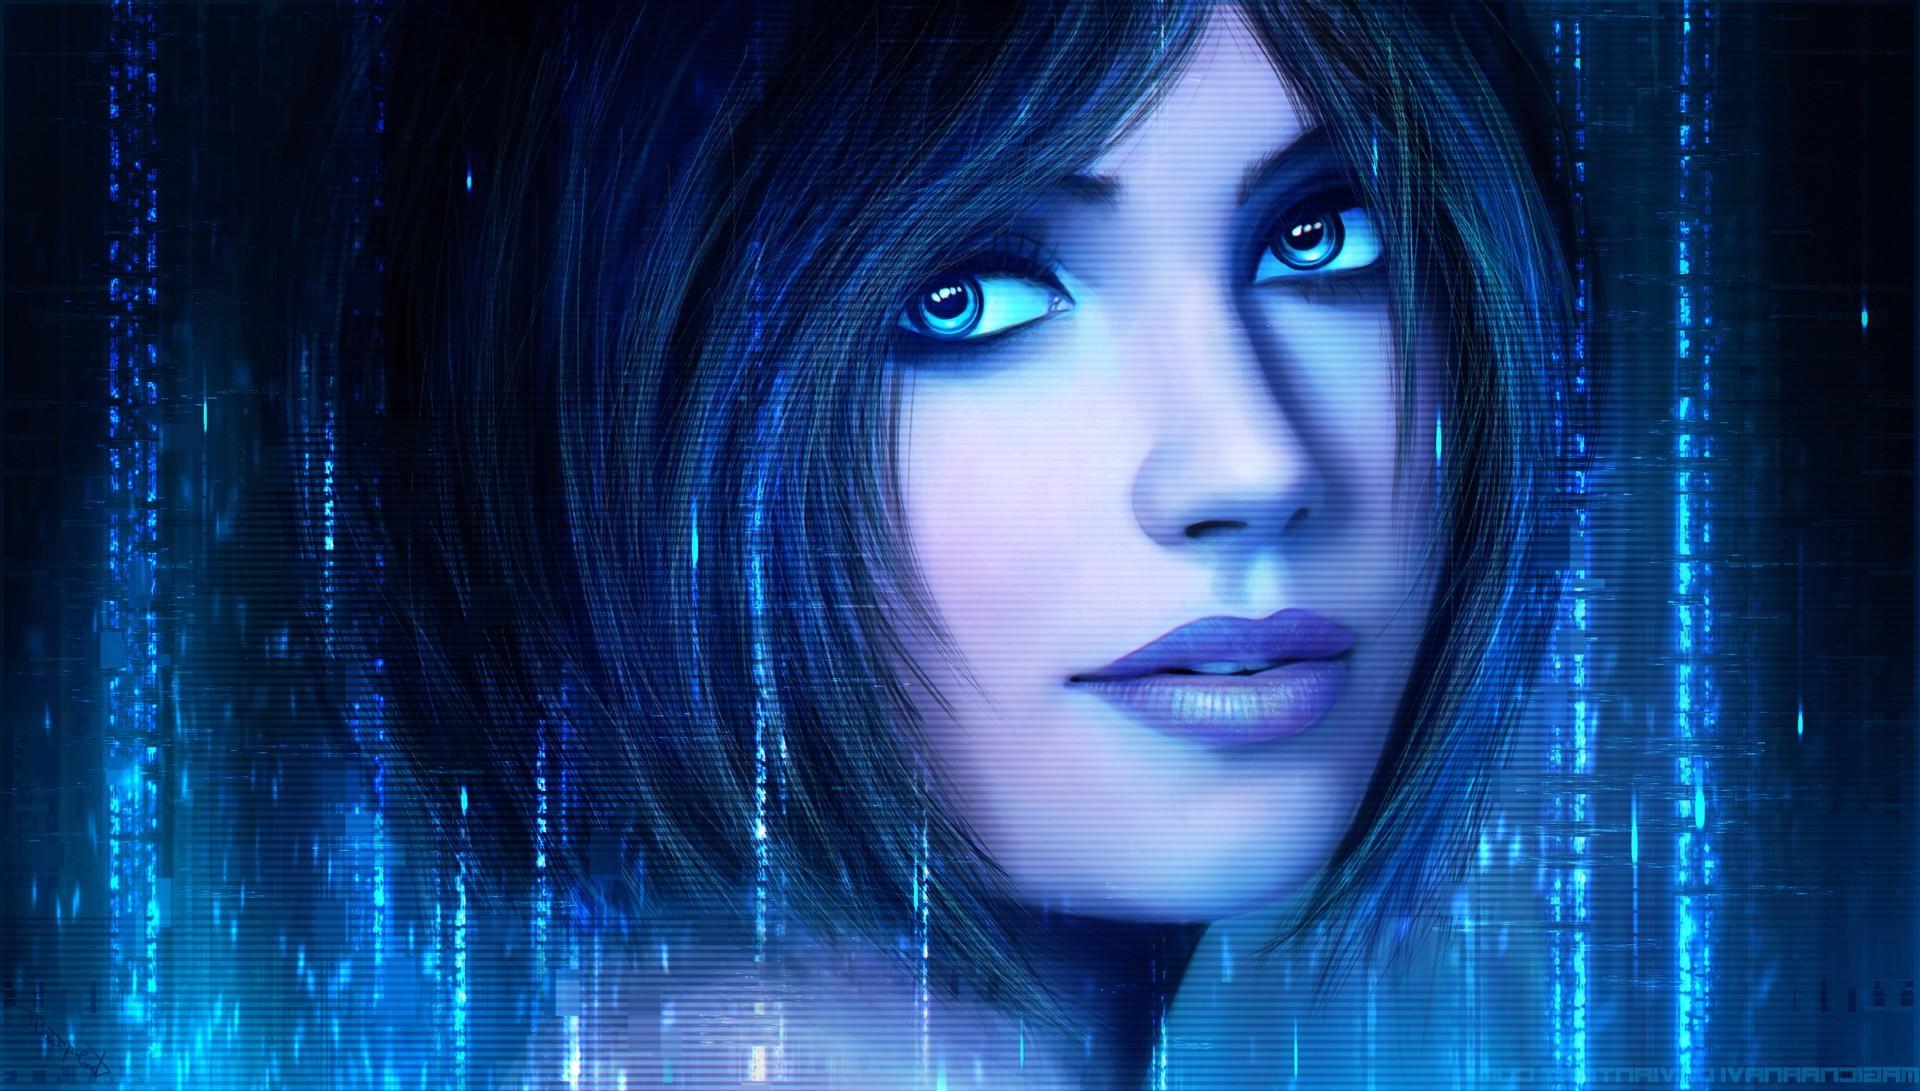 Cortana Moving Wallpaper 72 images 1920x1091